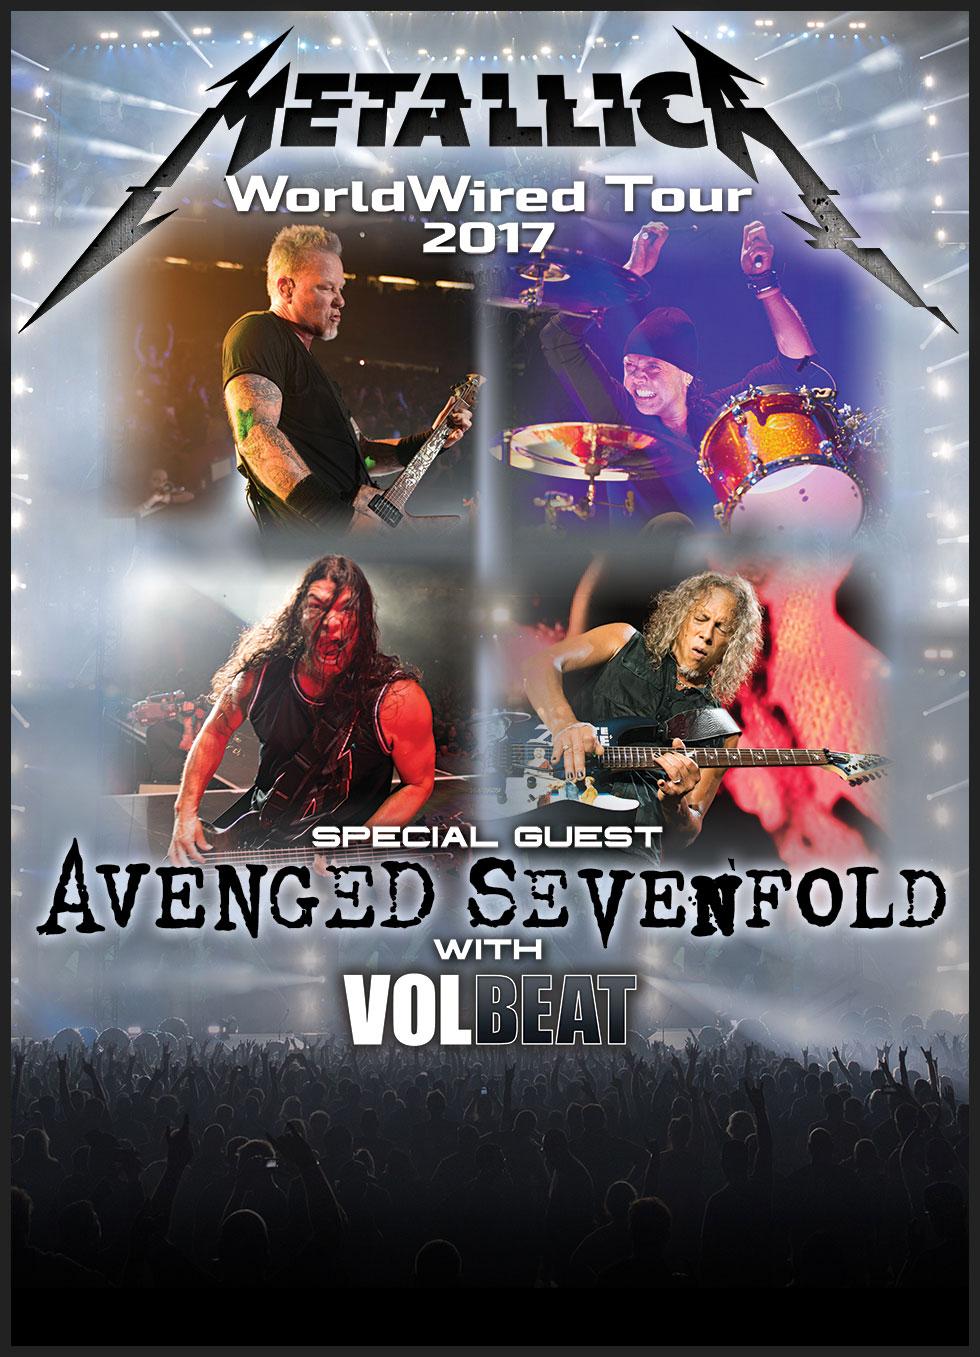 Metallica Worldwired Tour Enhanced Experiences